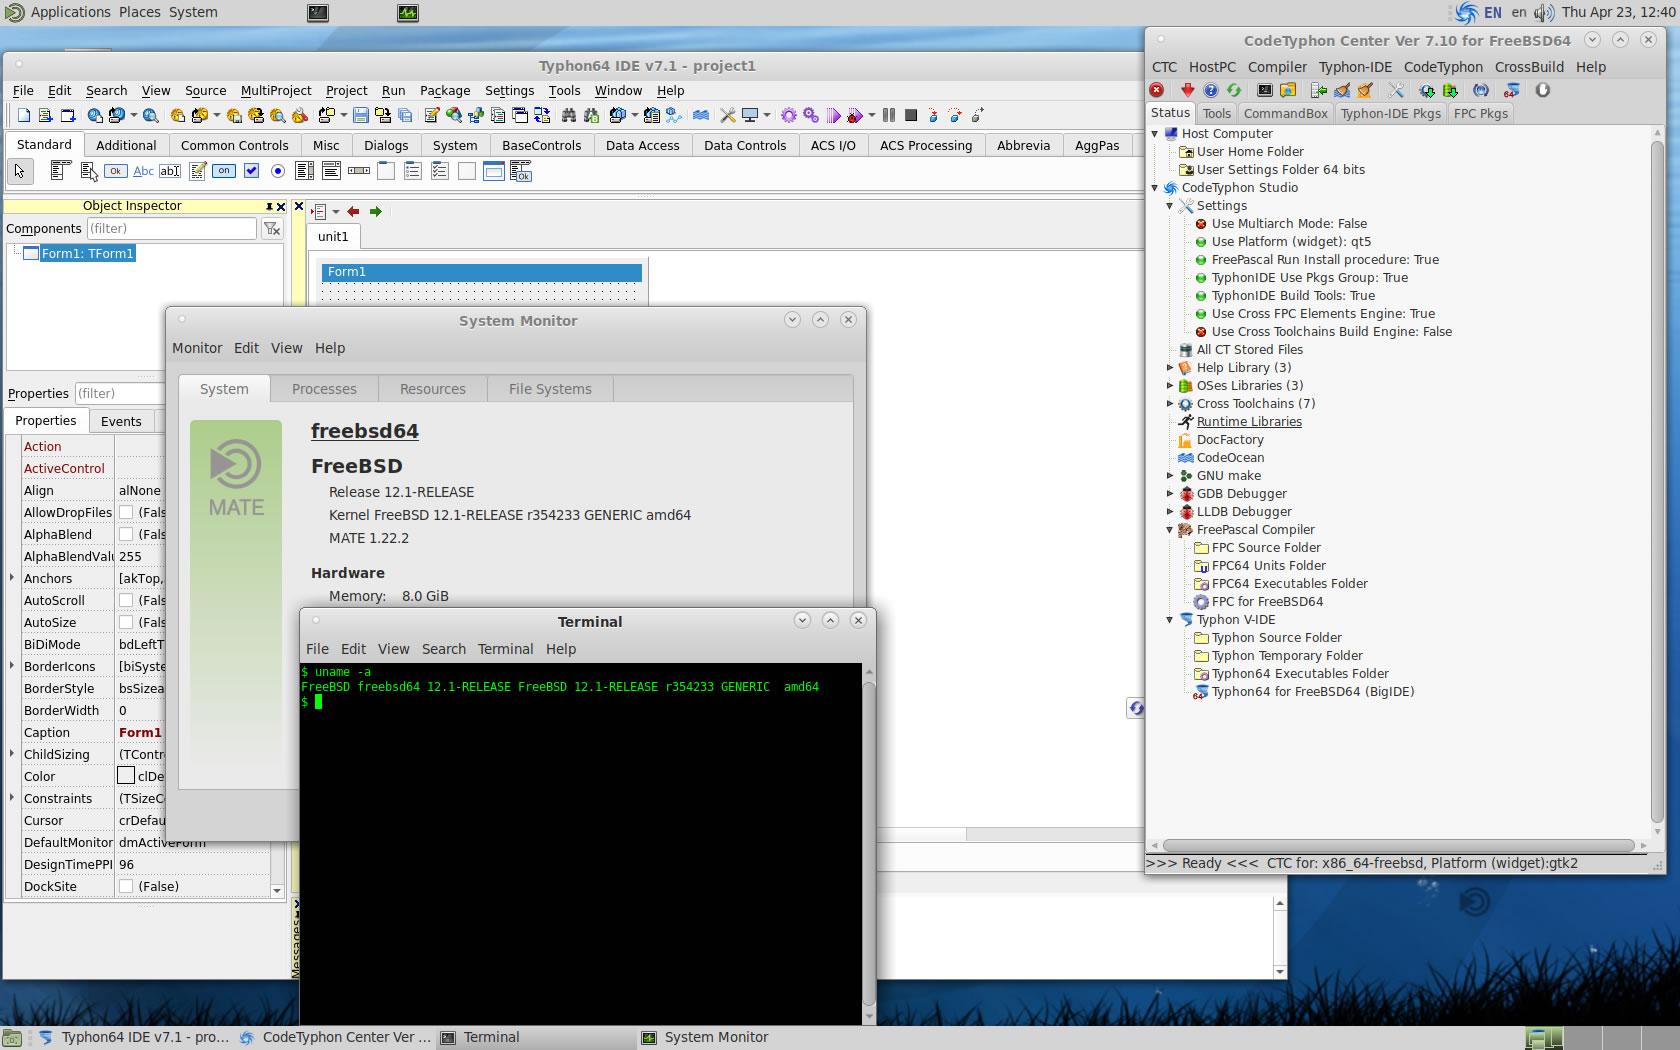 FreeBSD64-o2.jpg